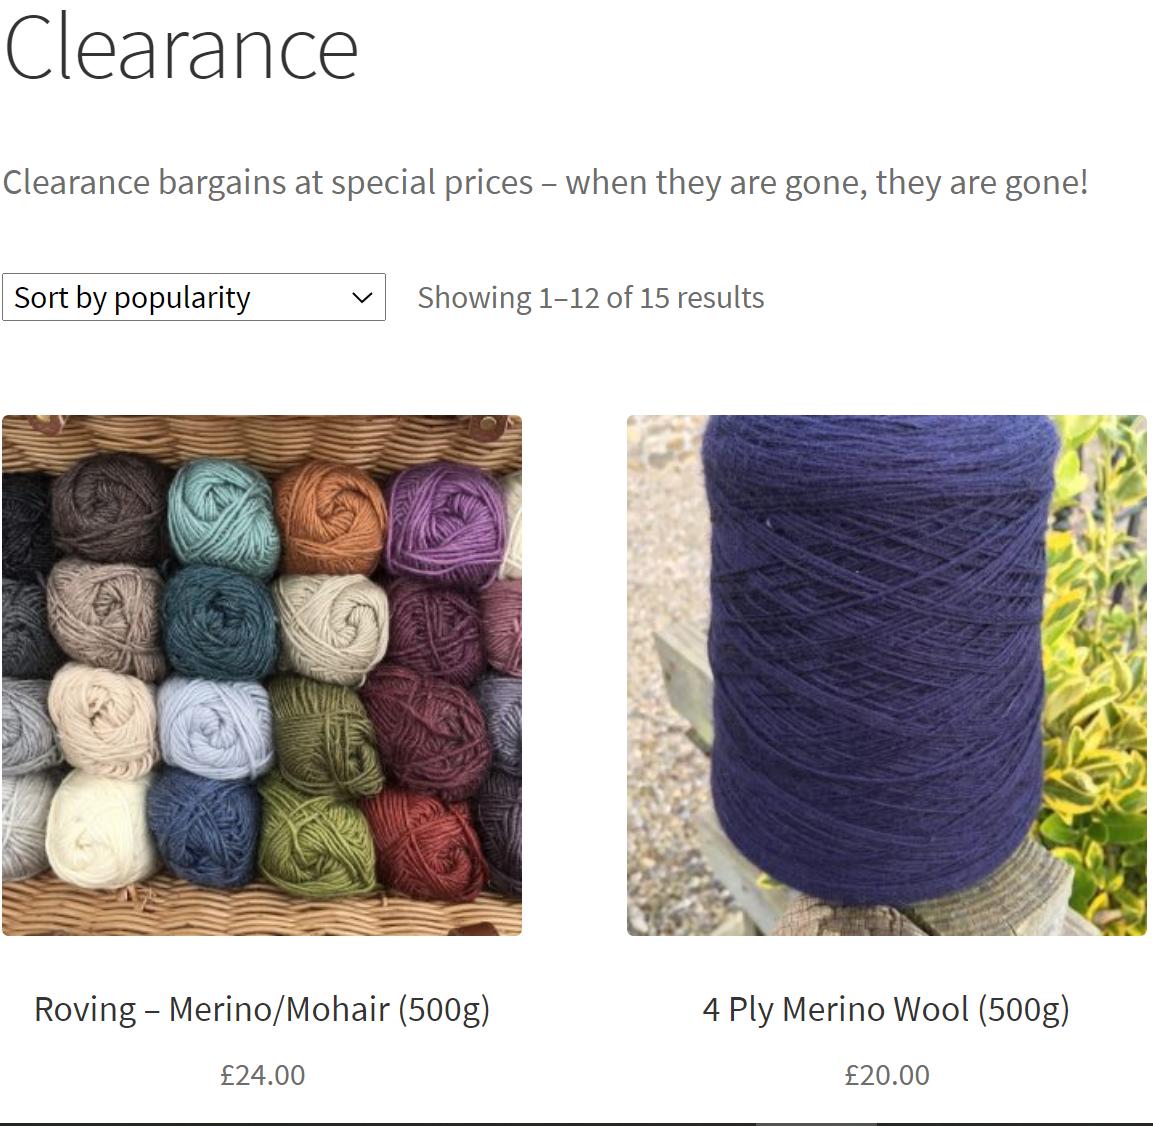 Wensleydale Longwool Sheep Shop Clearance bargains